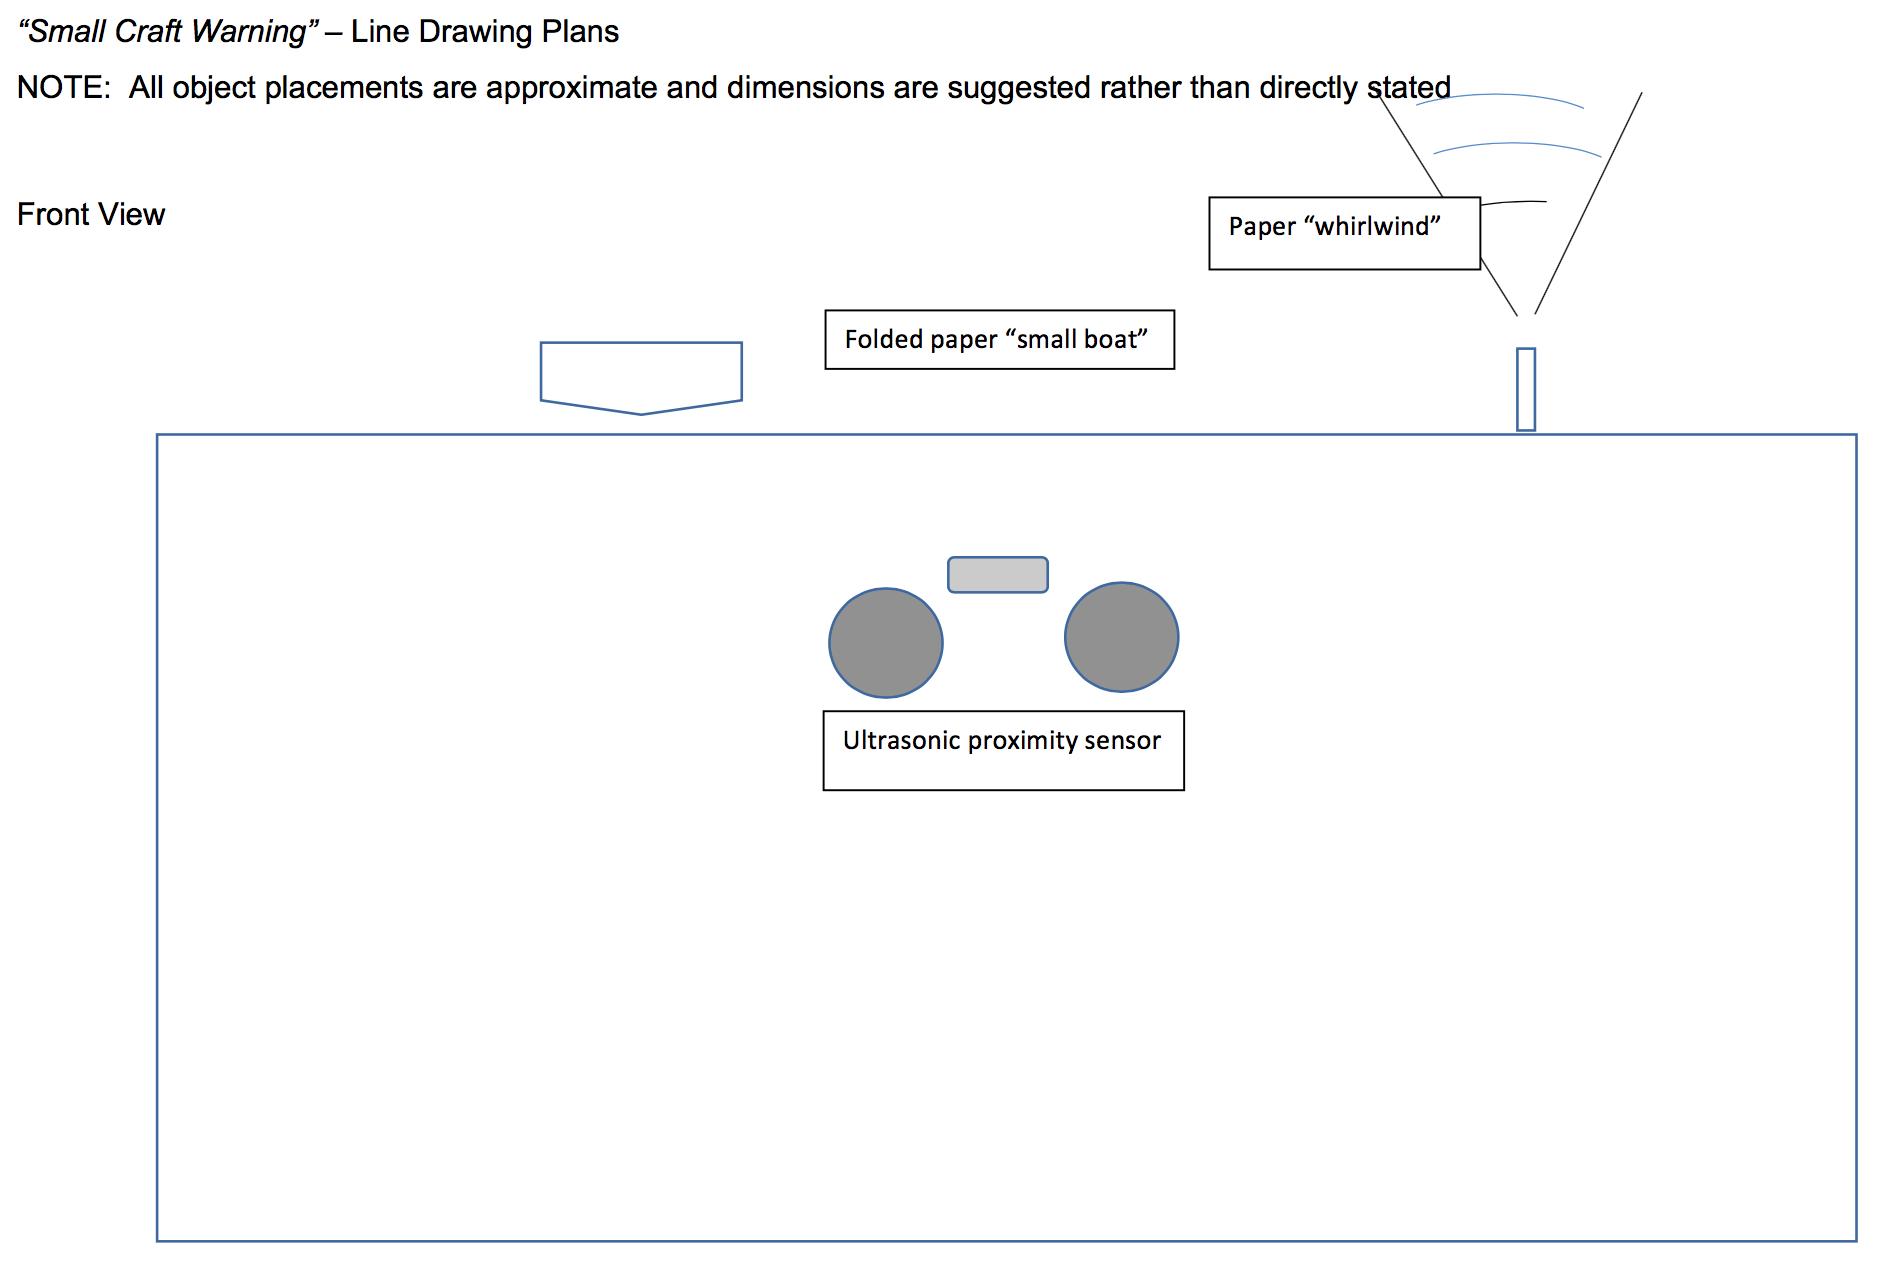 exp1-design1-rjbb-kc-df